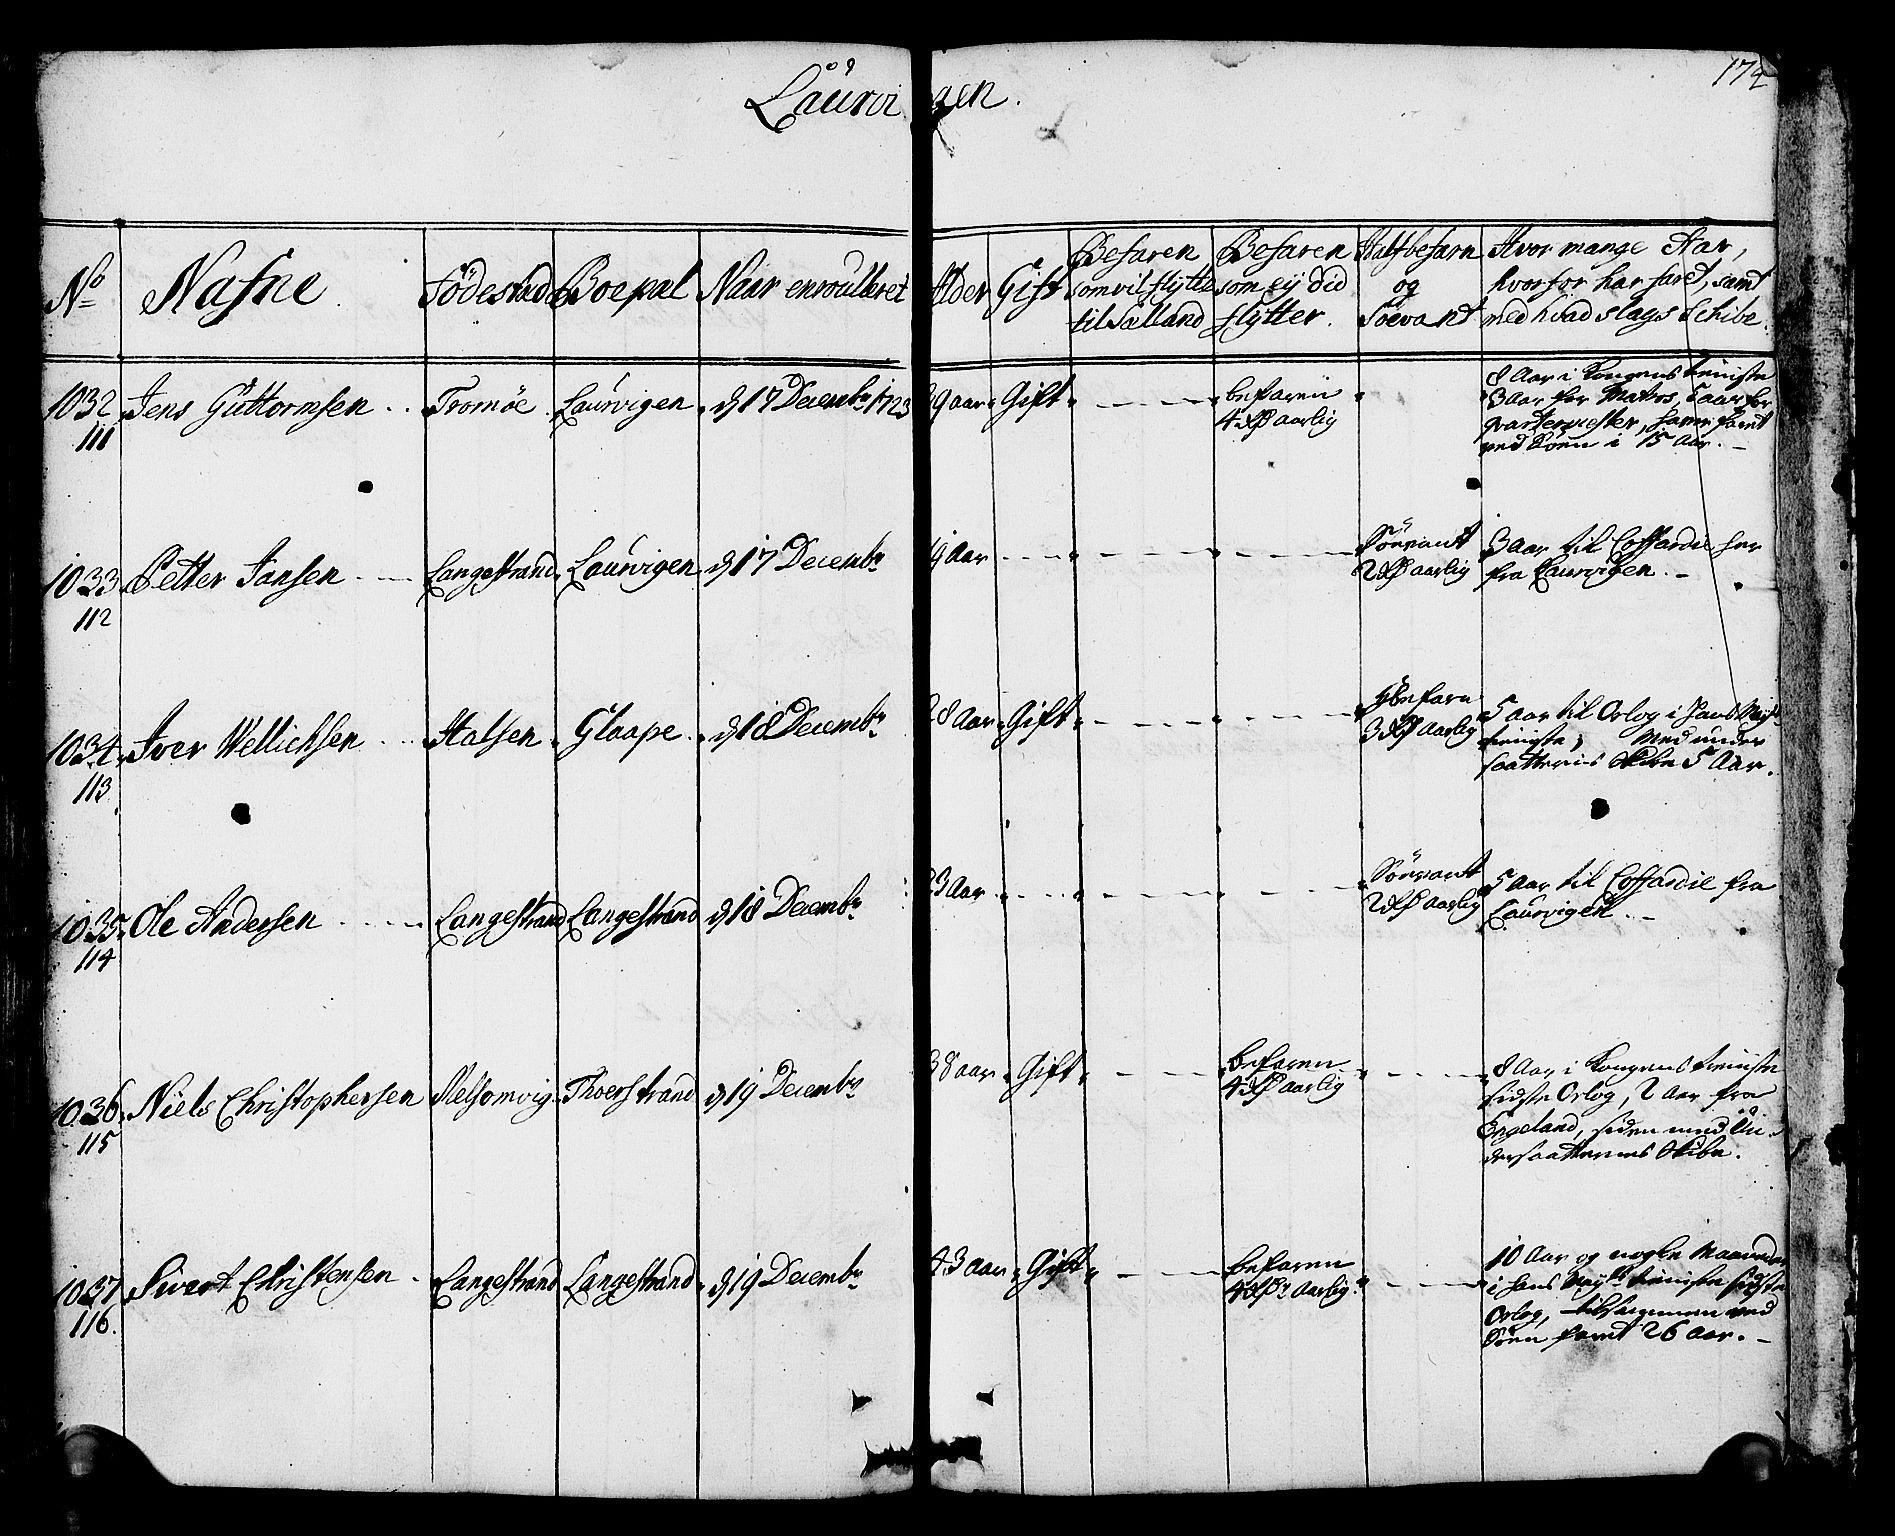 SAKO, Drammen innrulleringsdistrikt, F/Fa/L0002: Hovedrulle, 1723-1726, p. 175